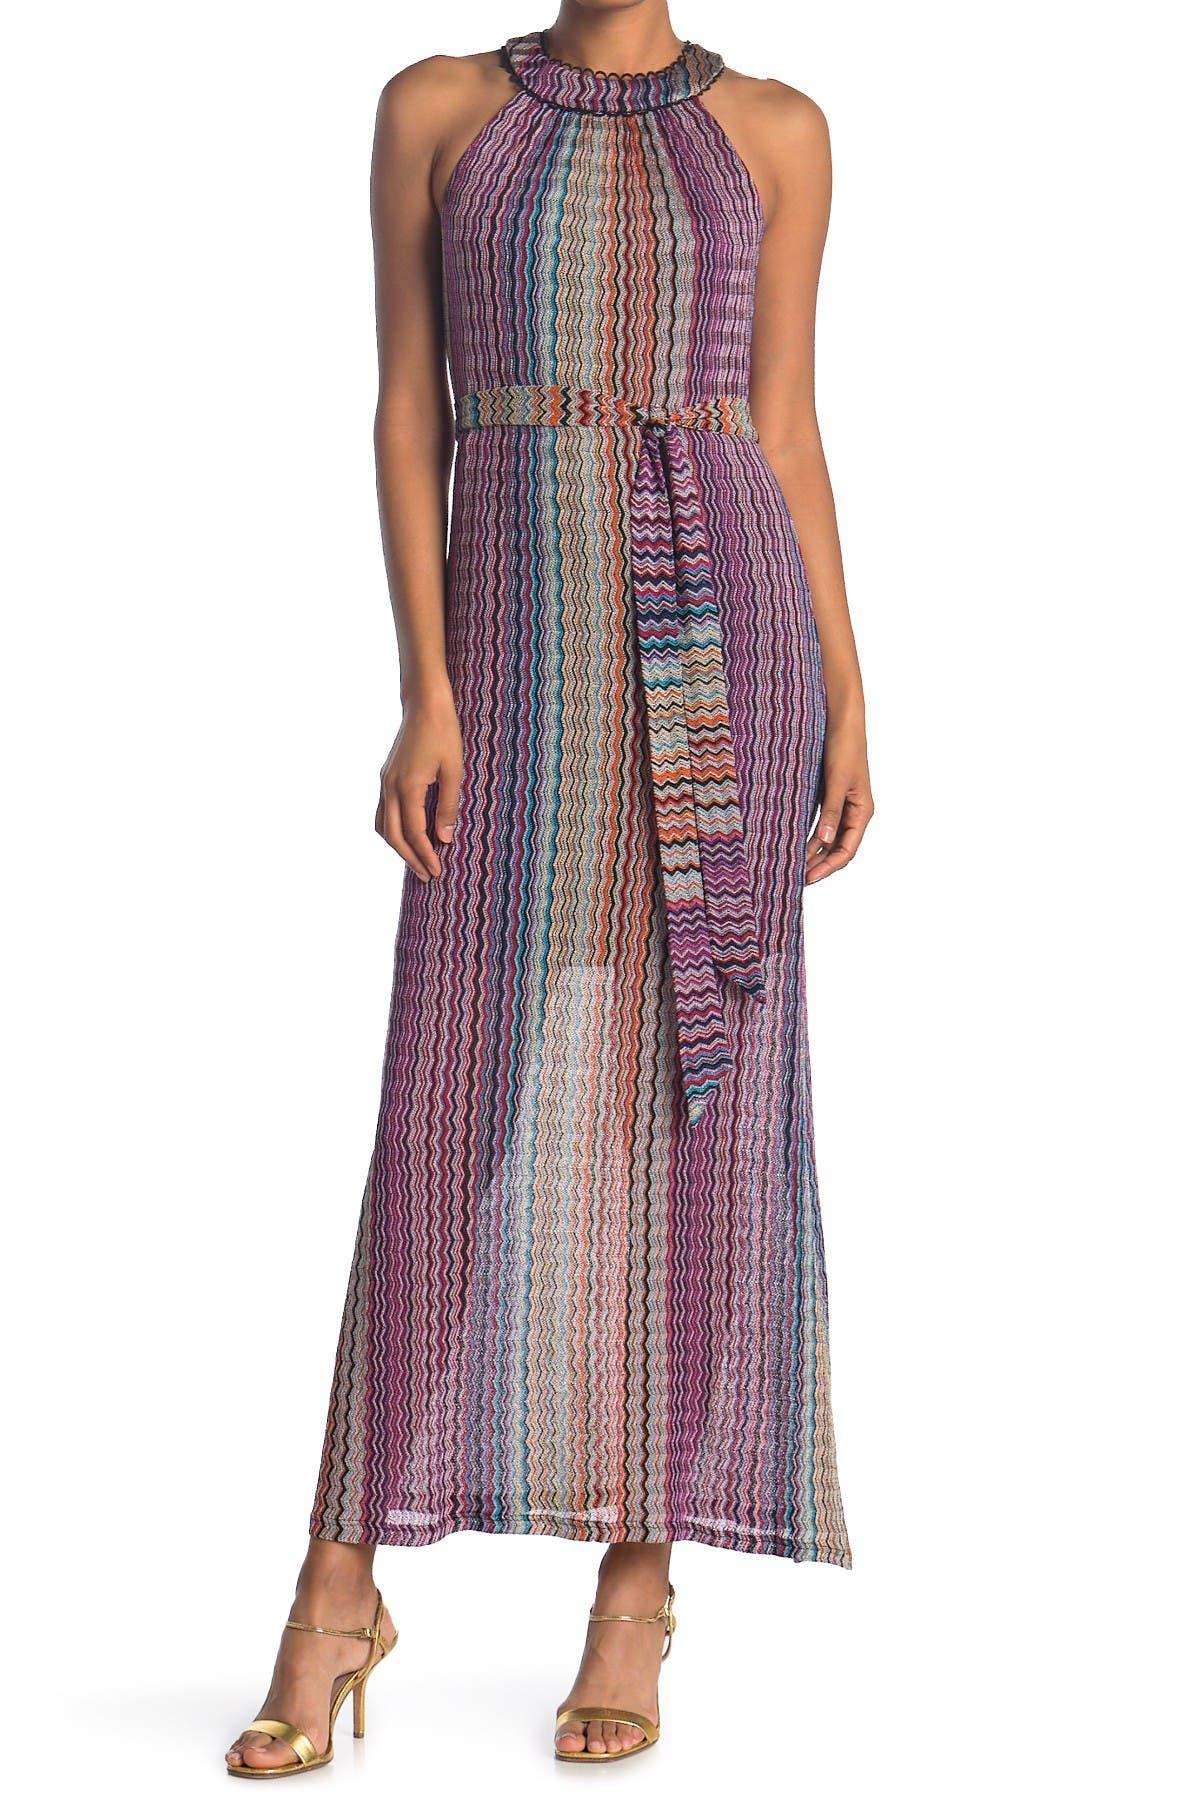 Image of Trina Turk Speak Easy Maxi Dress